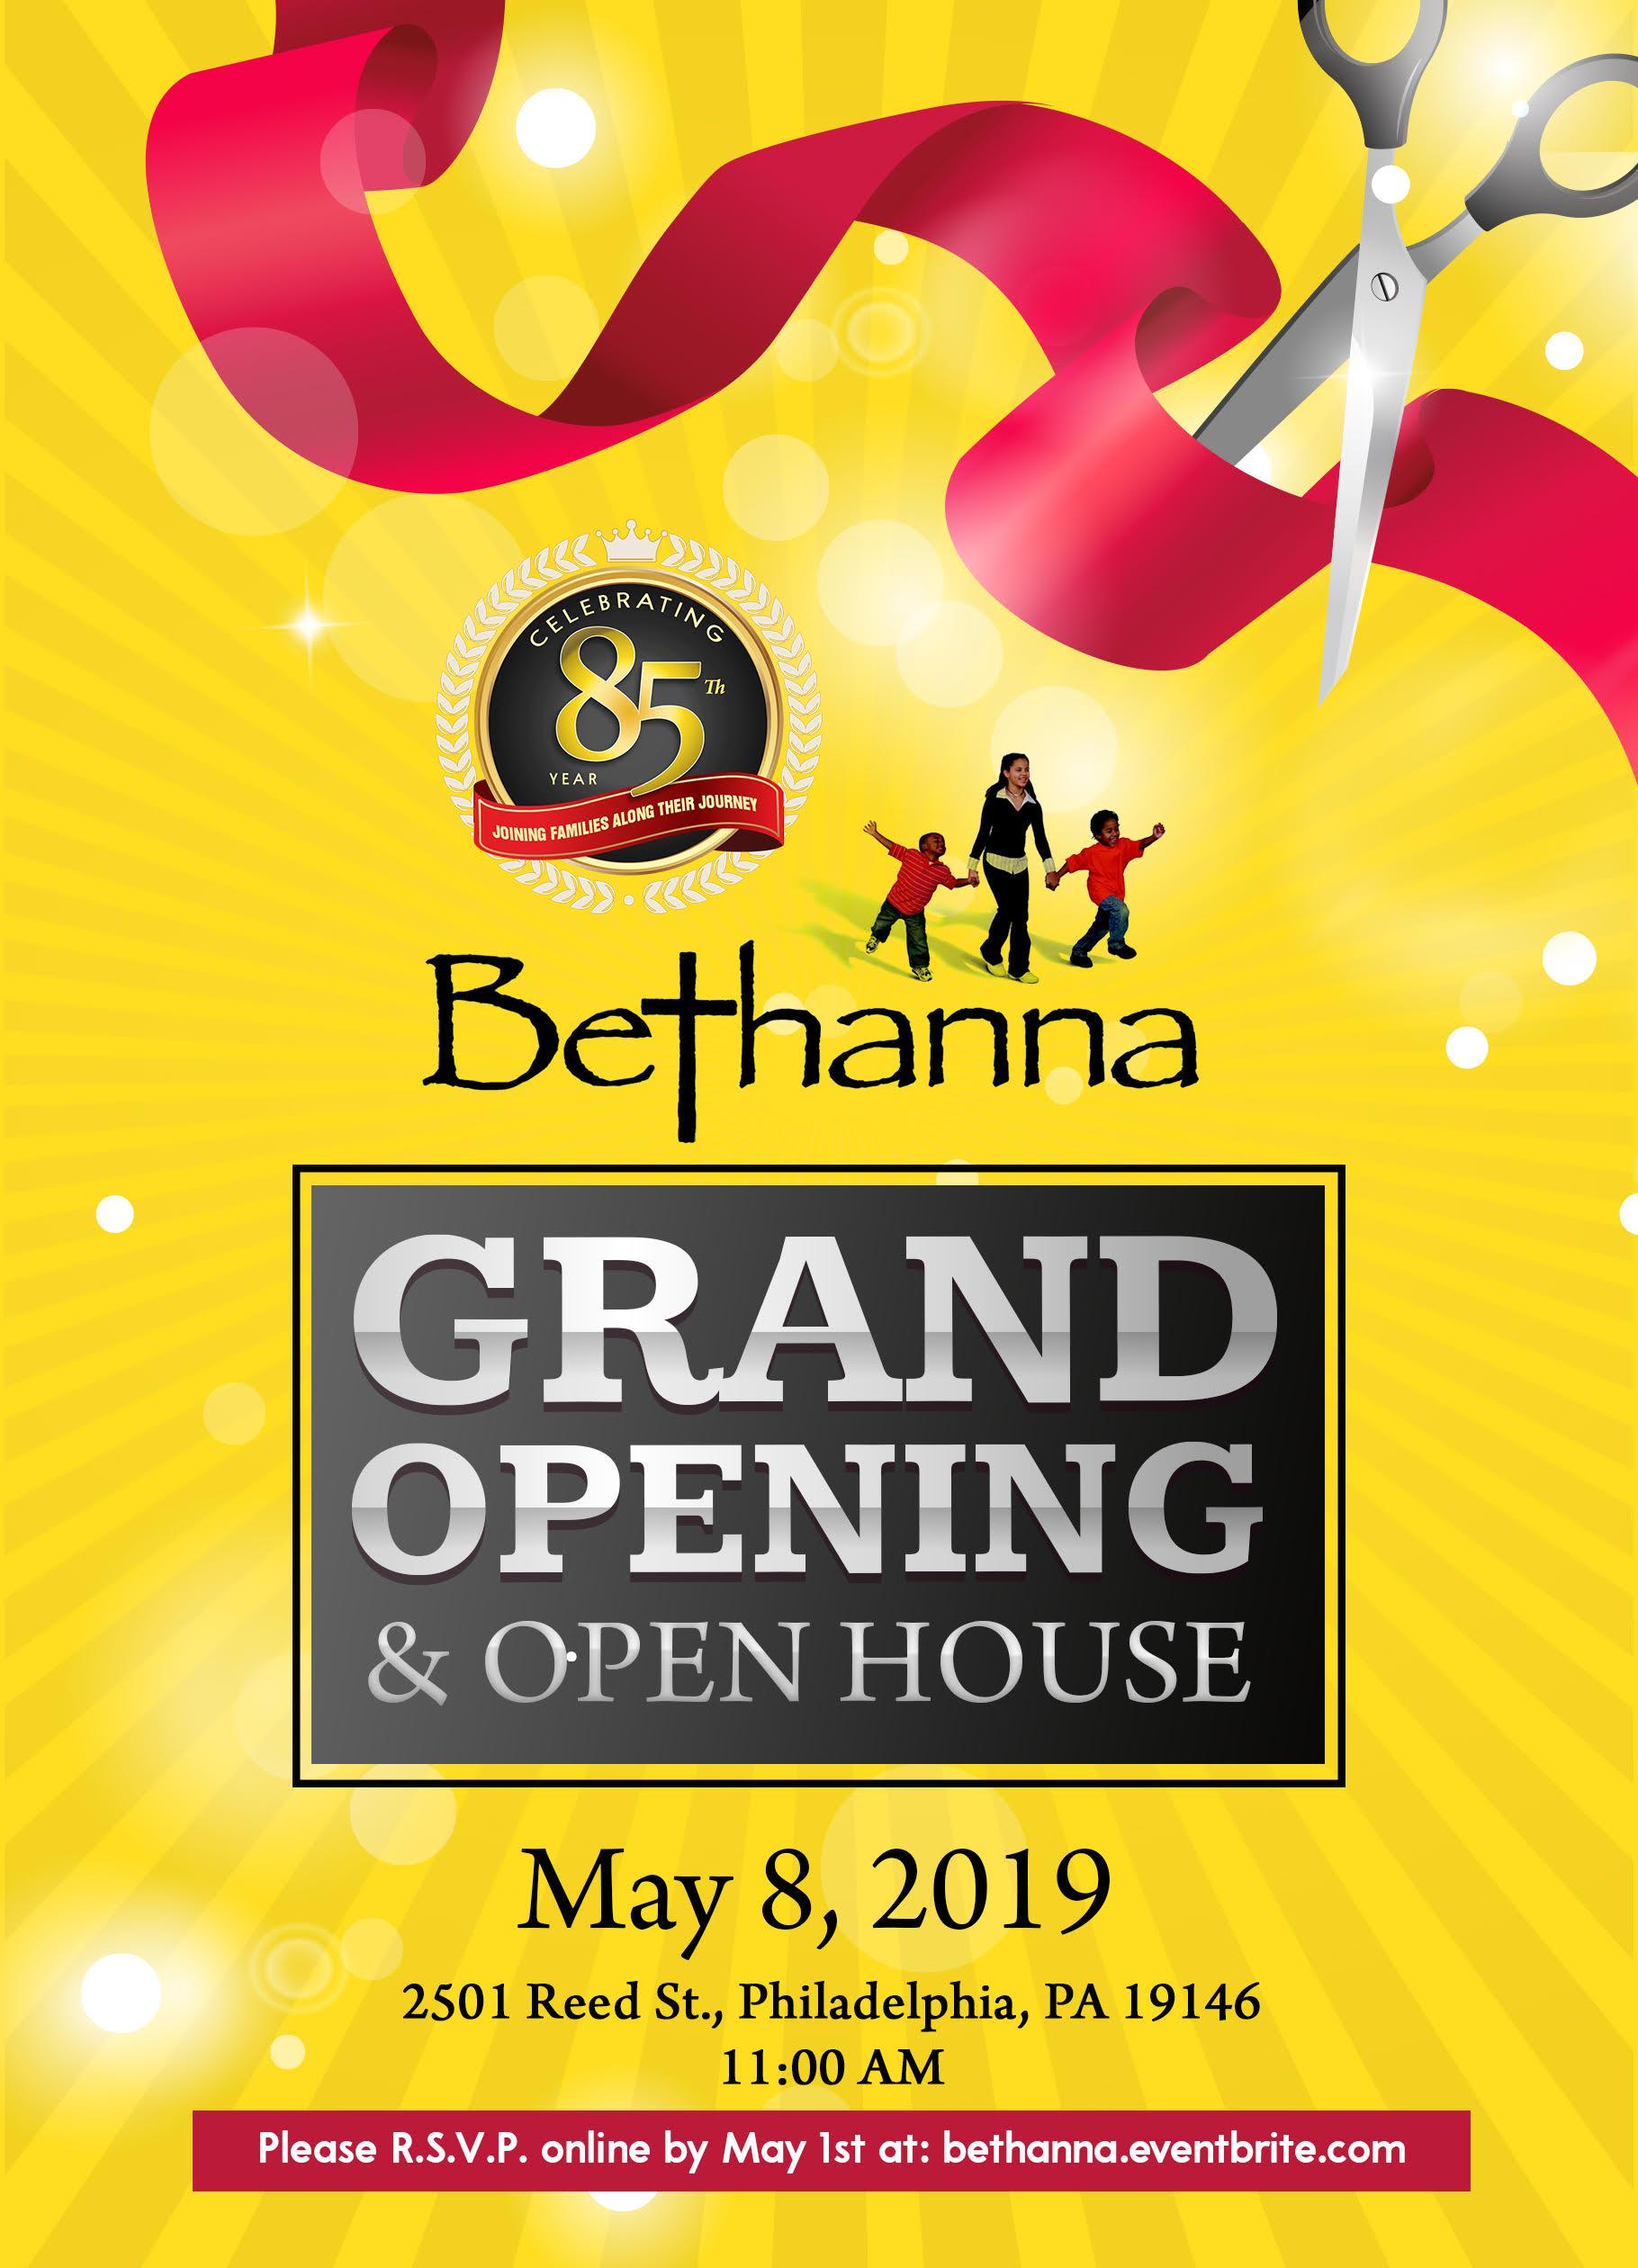 Bethanna Grand Opening Flyer.jpg